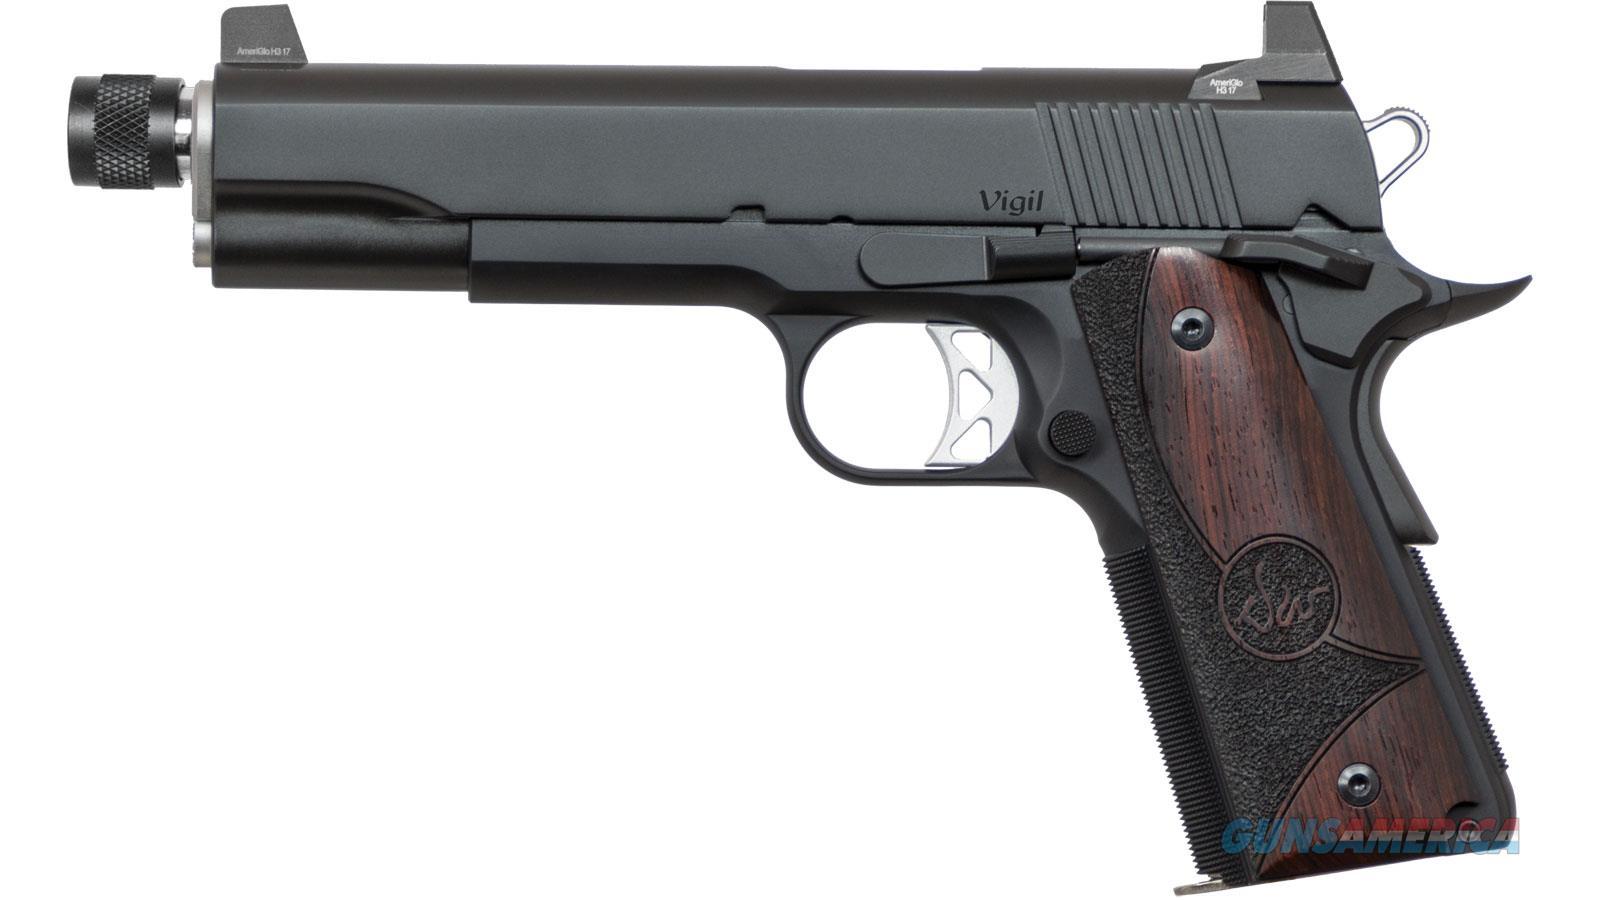 Cz Usa Dw Vigil Suppressor Ready 01830  Guns > Pistols > C Misc Pistols